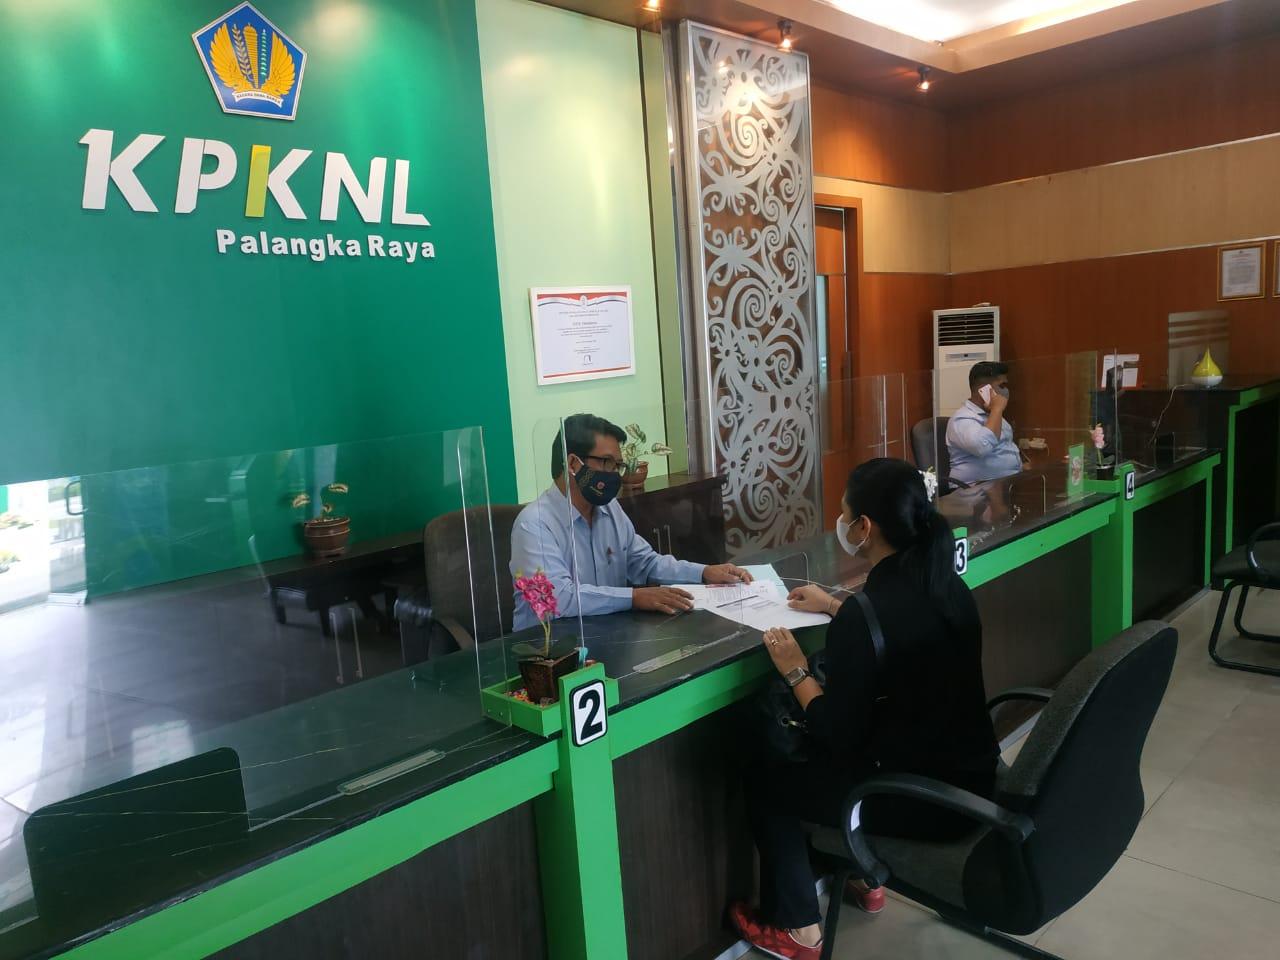 KPKNL Palangka Raya Sampaikan Keunggulan Crash Program pada Para Debitur dan Penyerah Utang